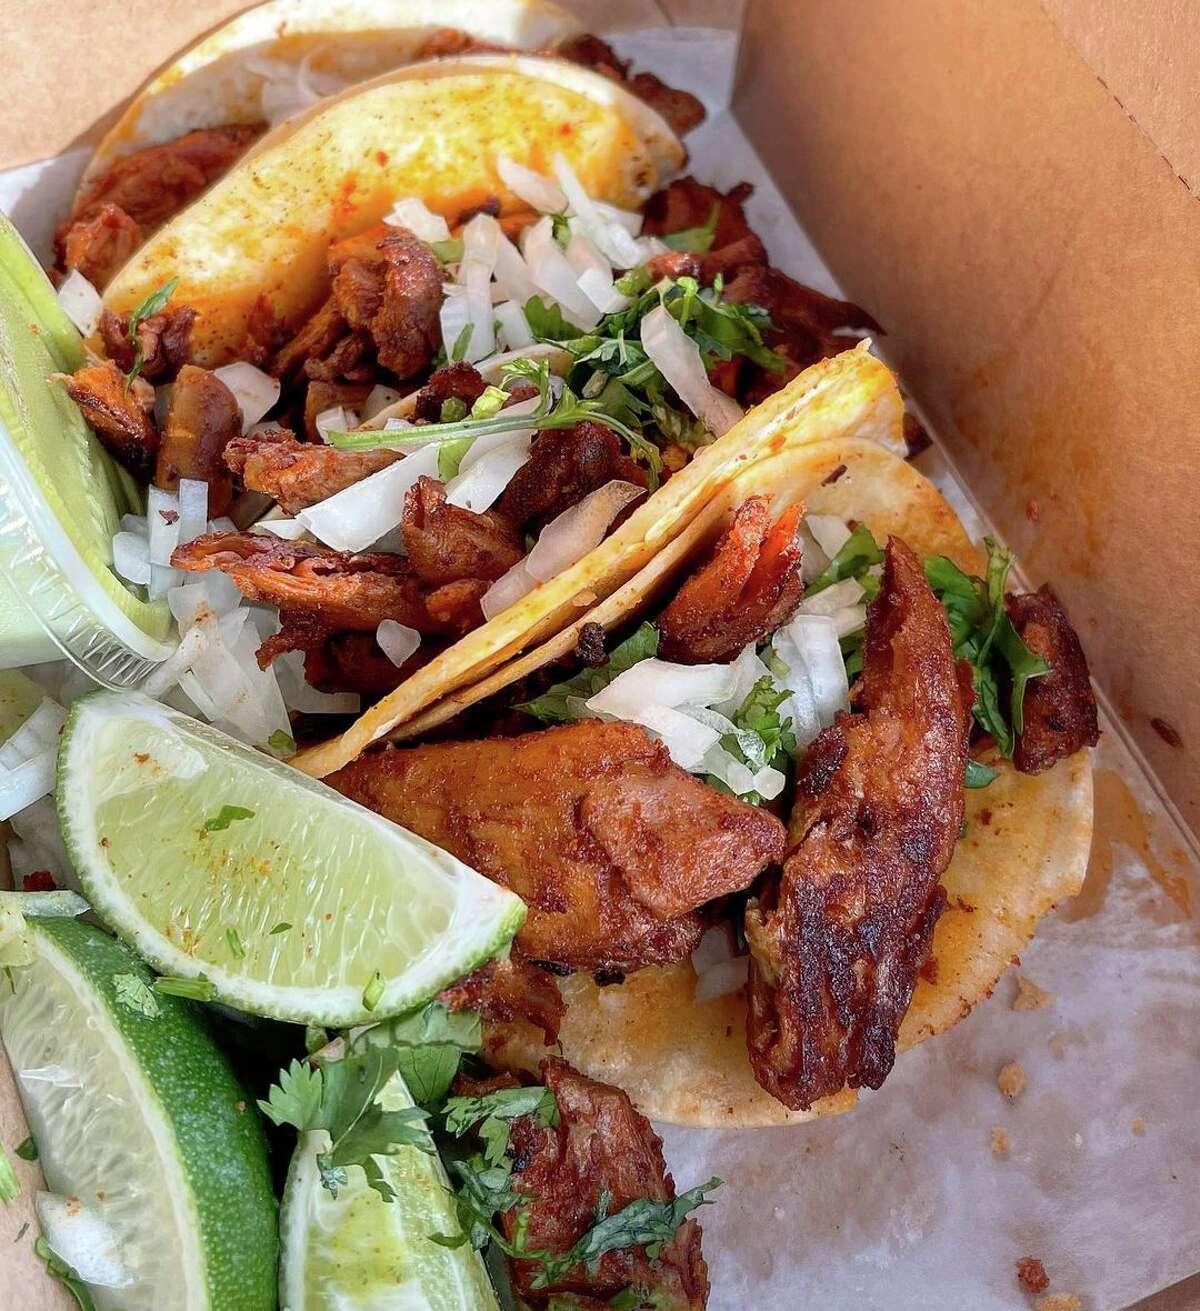 Vegan carne asada and vegan al pastor tacos at Korny Vibes.